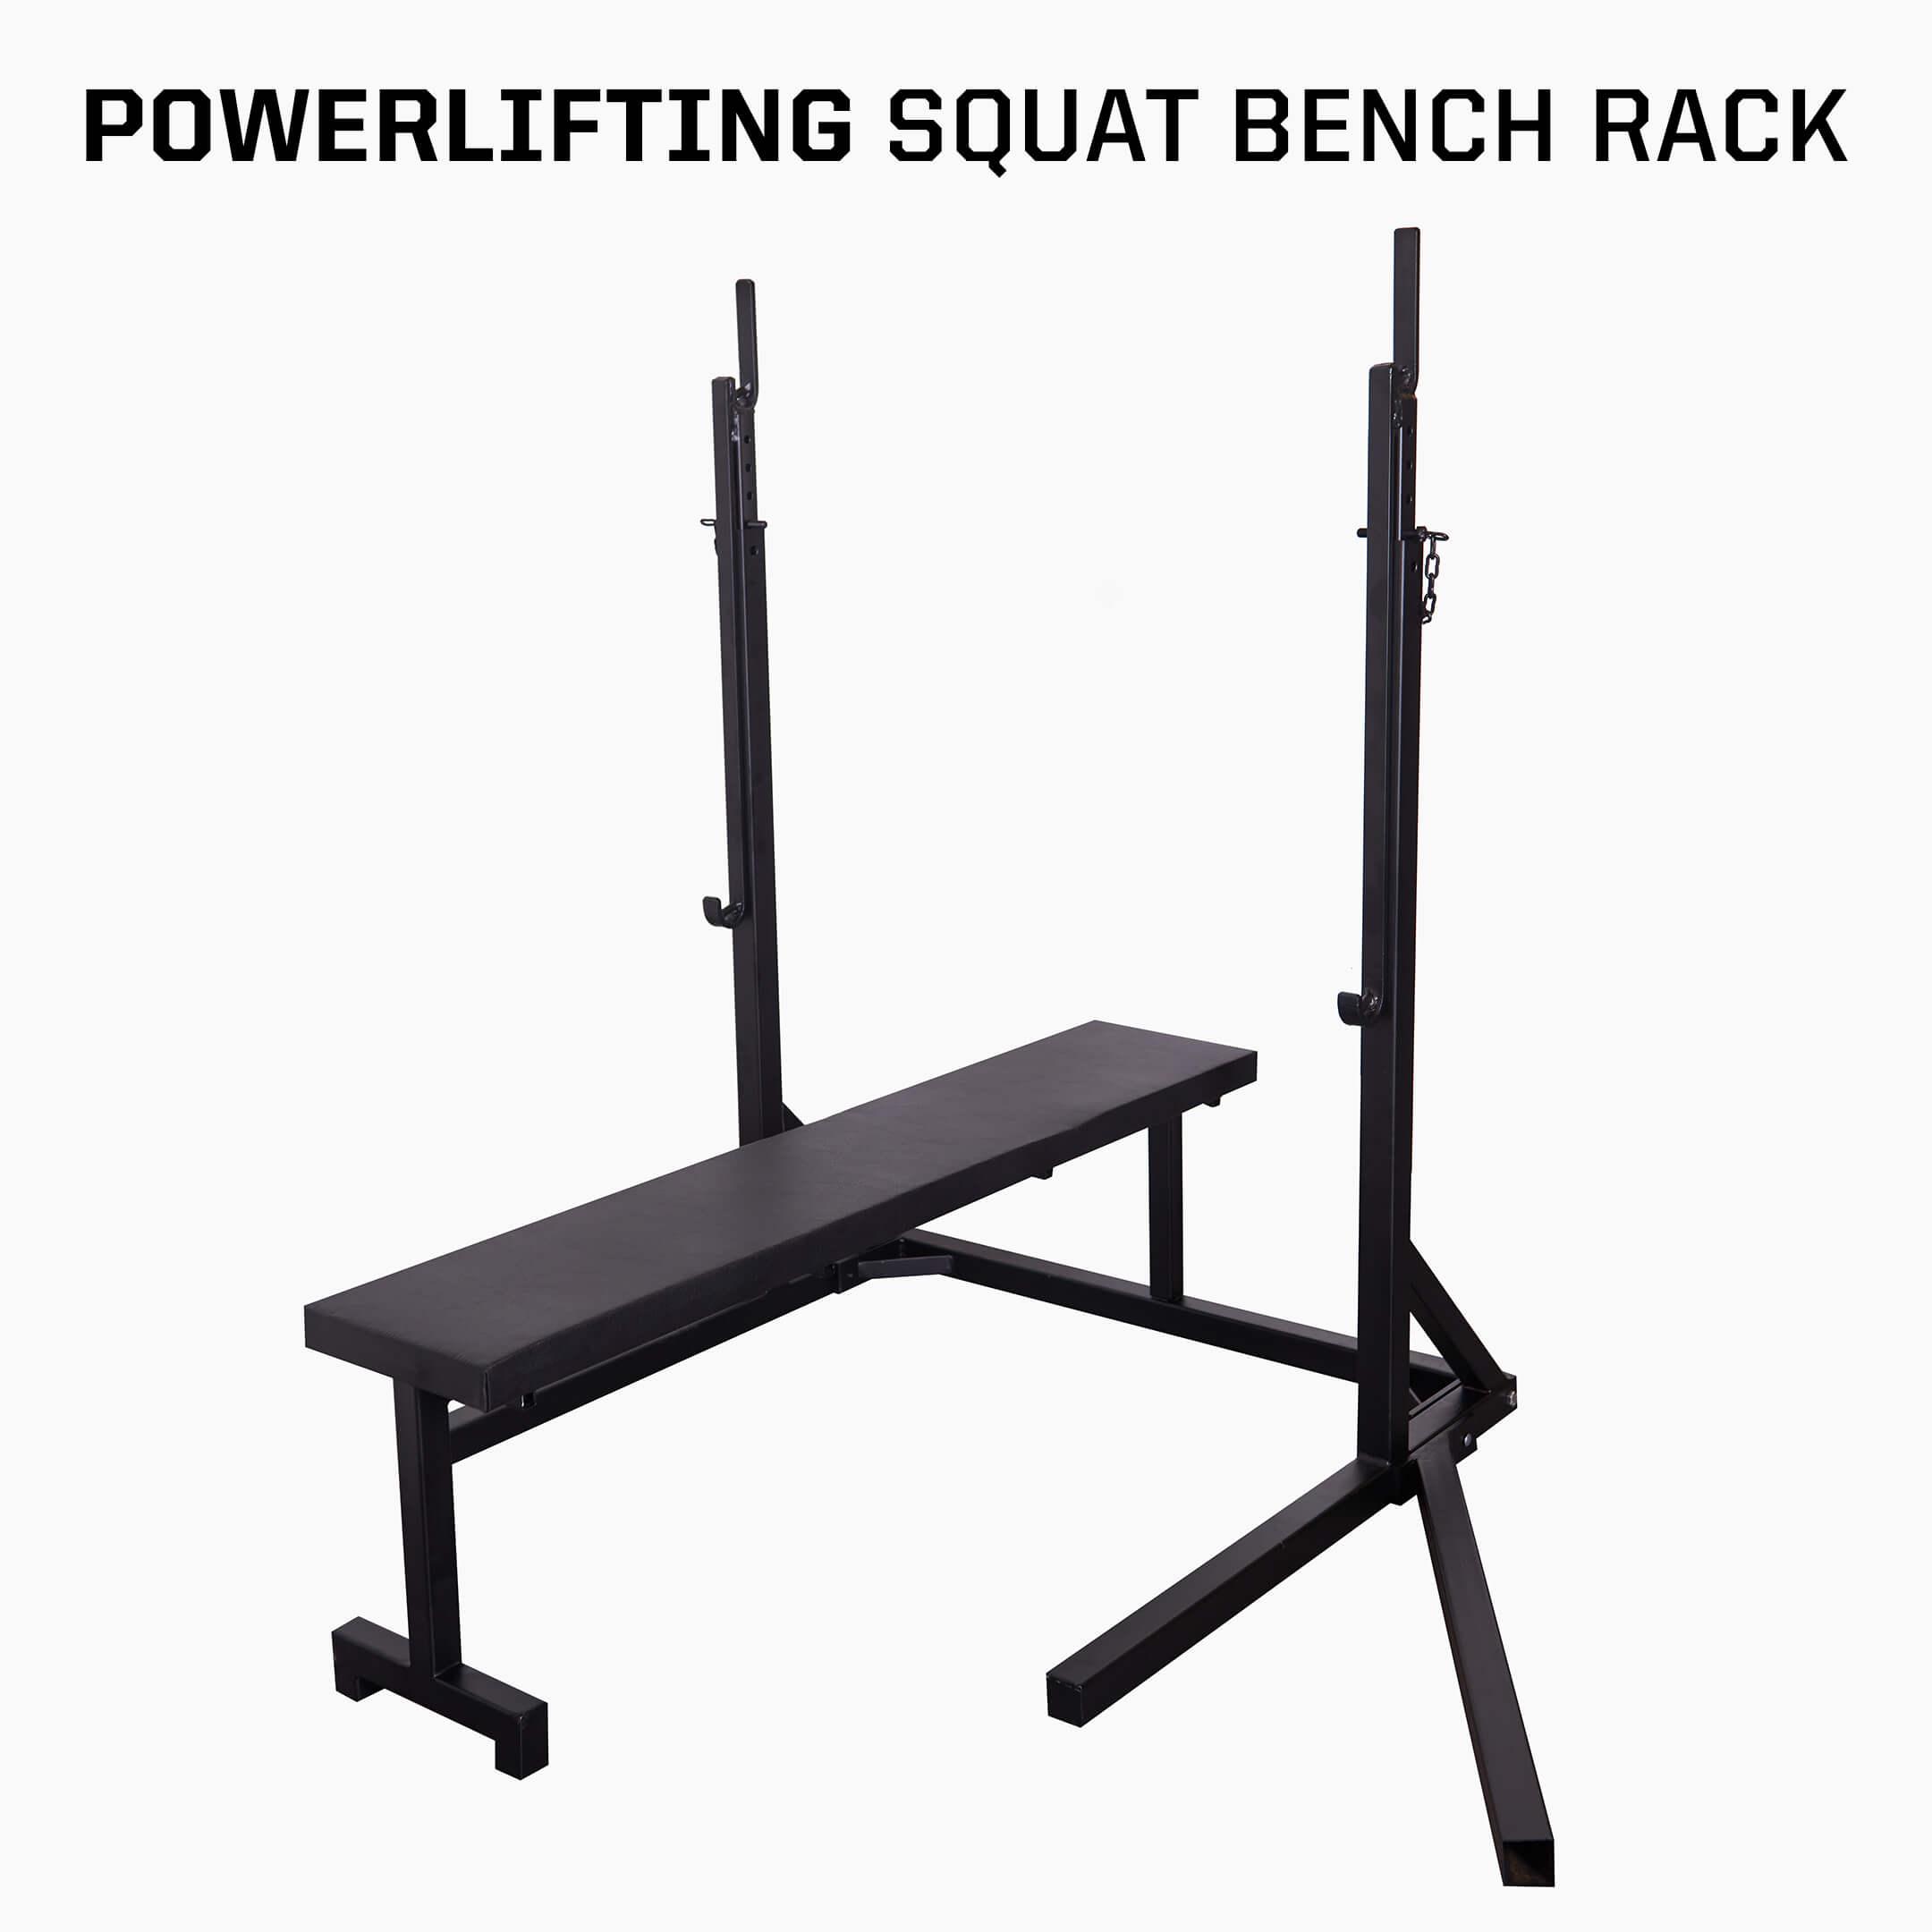 ağırsağlam squat bench rack